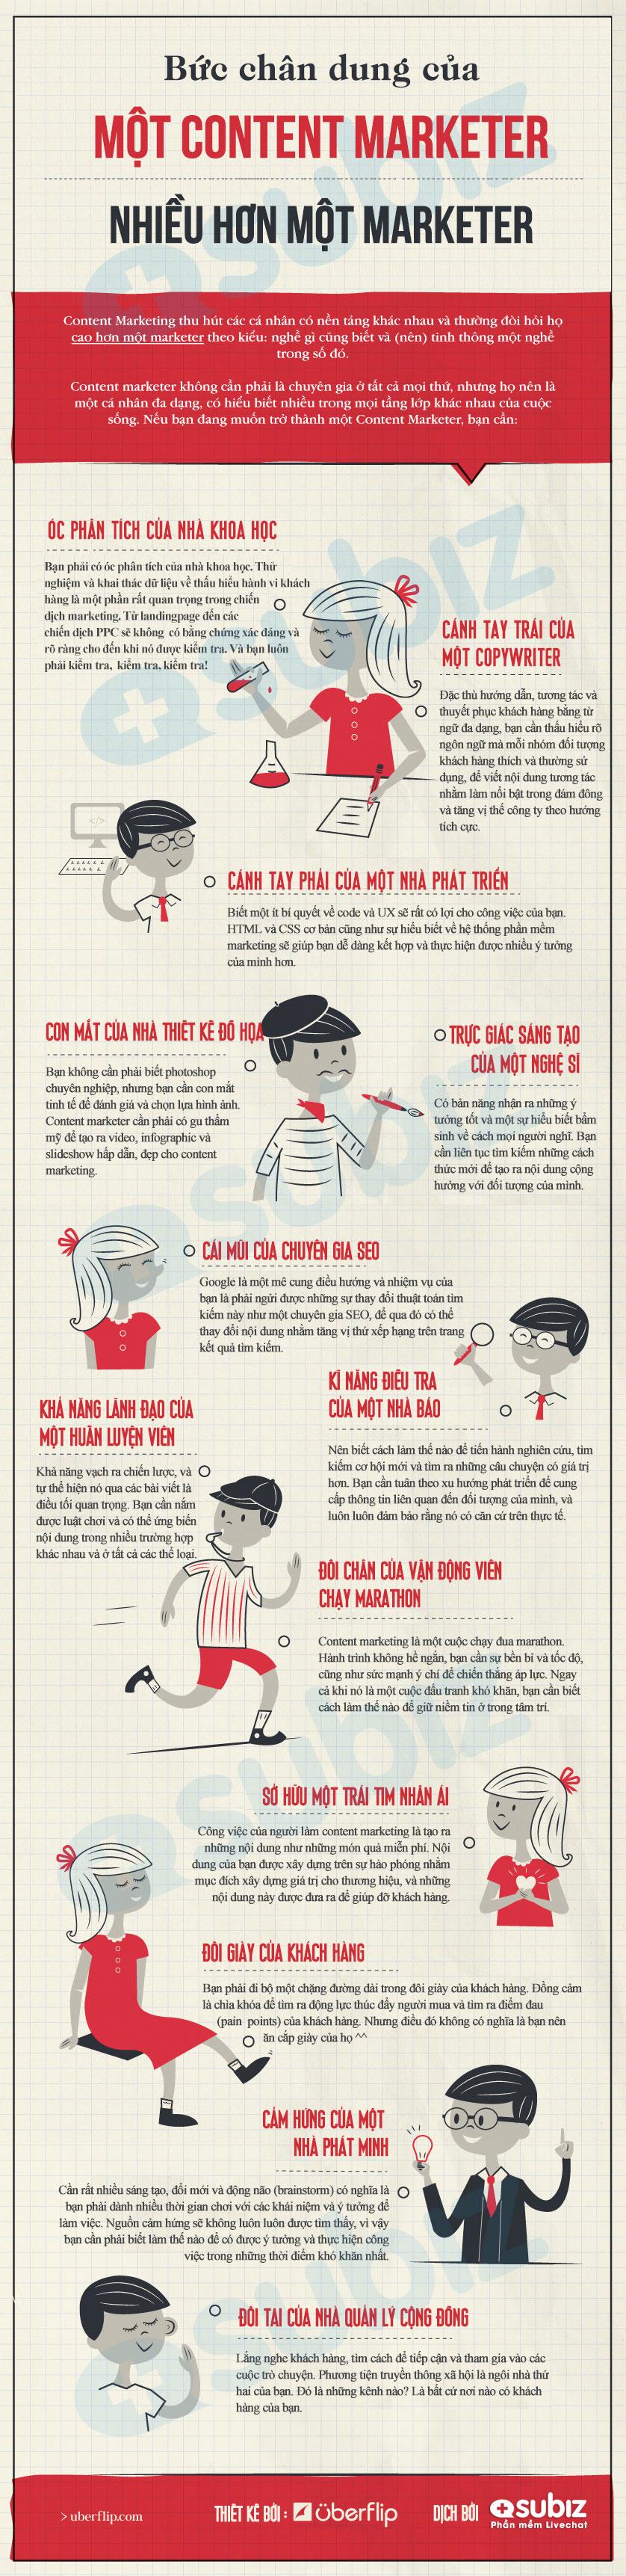 Subiz-content-marketer-infographic